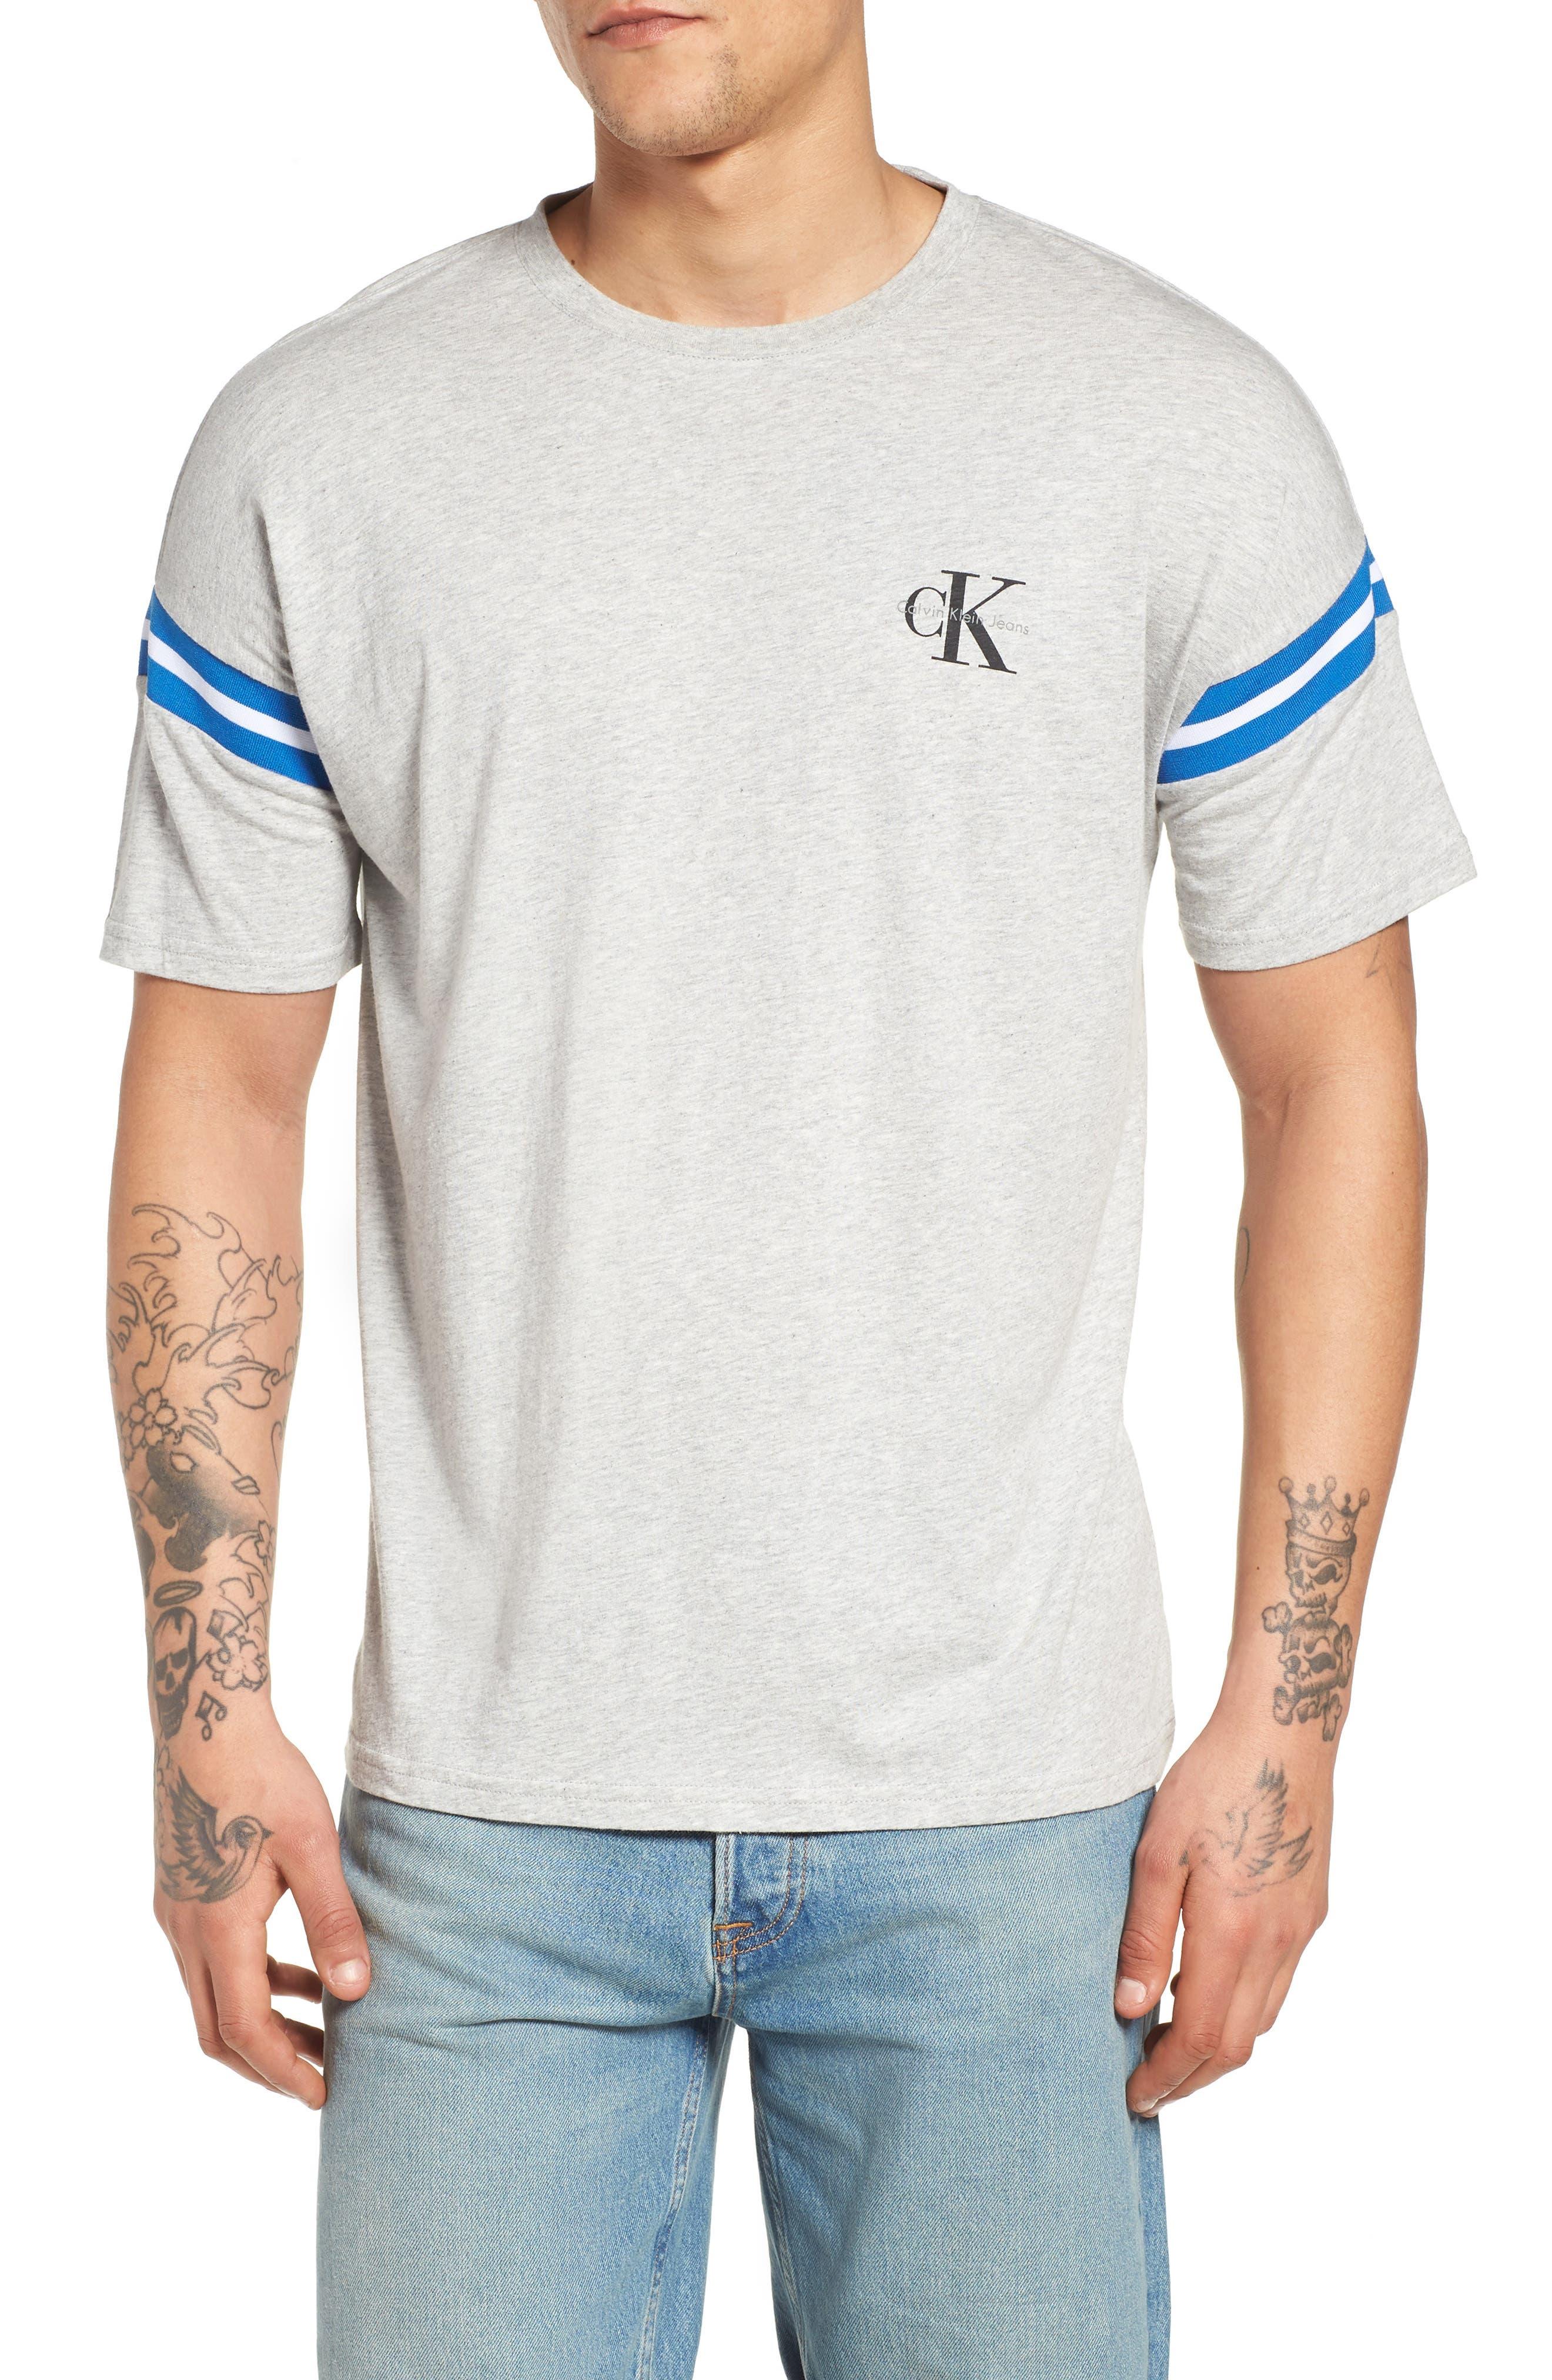 Main Image - Calvin Klein Jeans Tipped T-Shirt